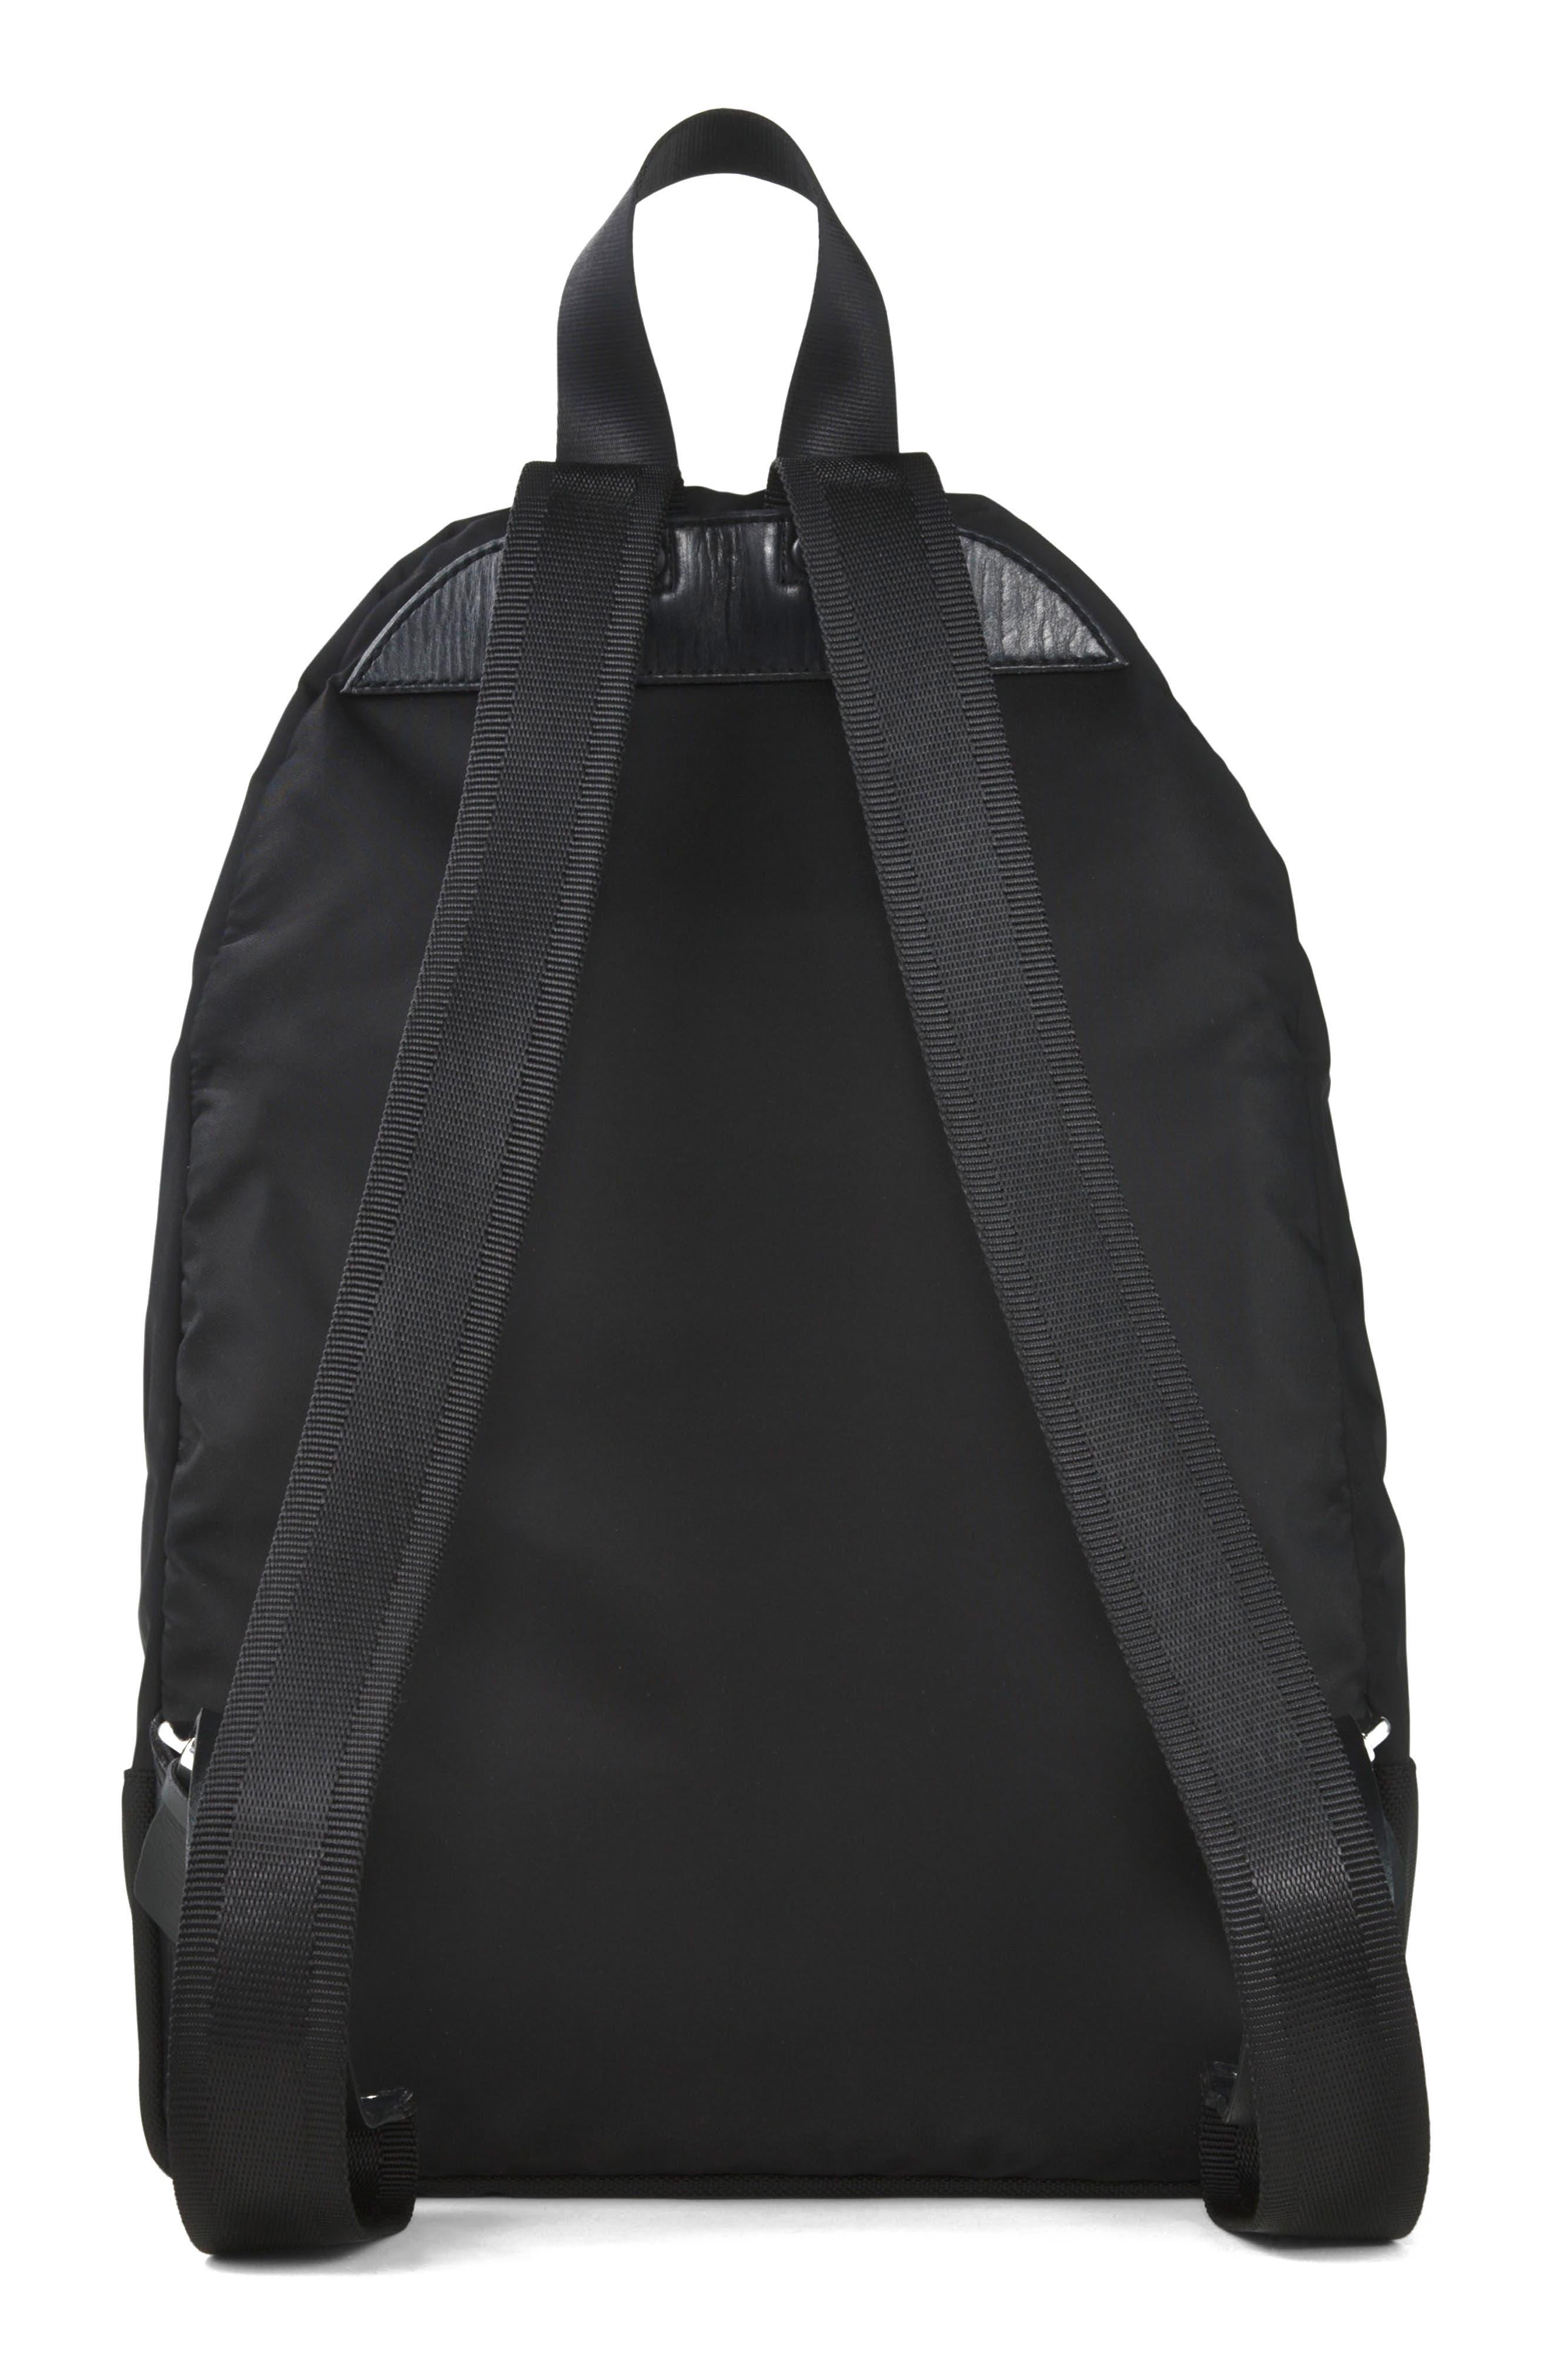 Tiger Print Backpack,                             Alternate thumbnail 4, color,                             Black